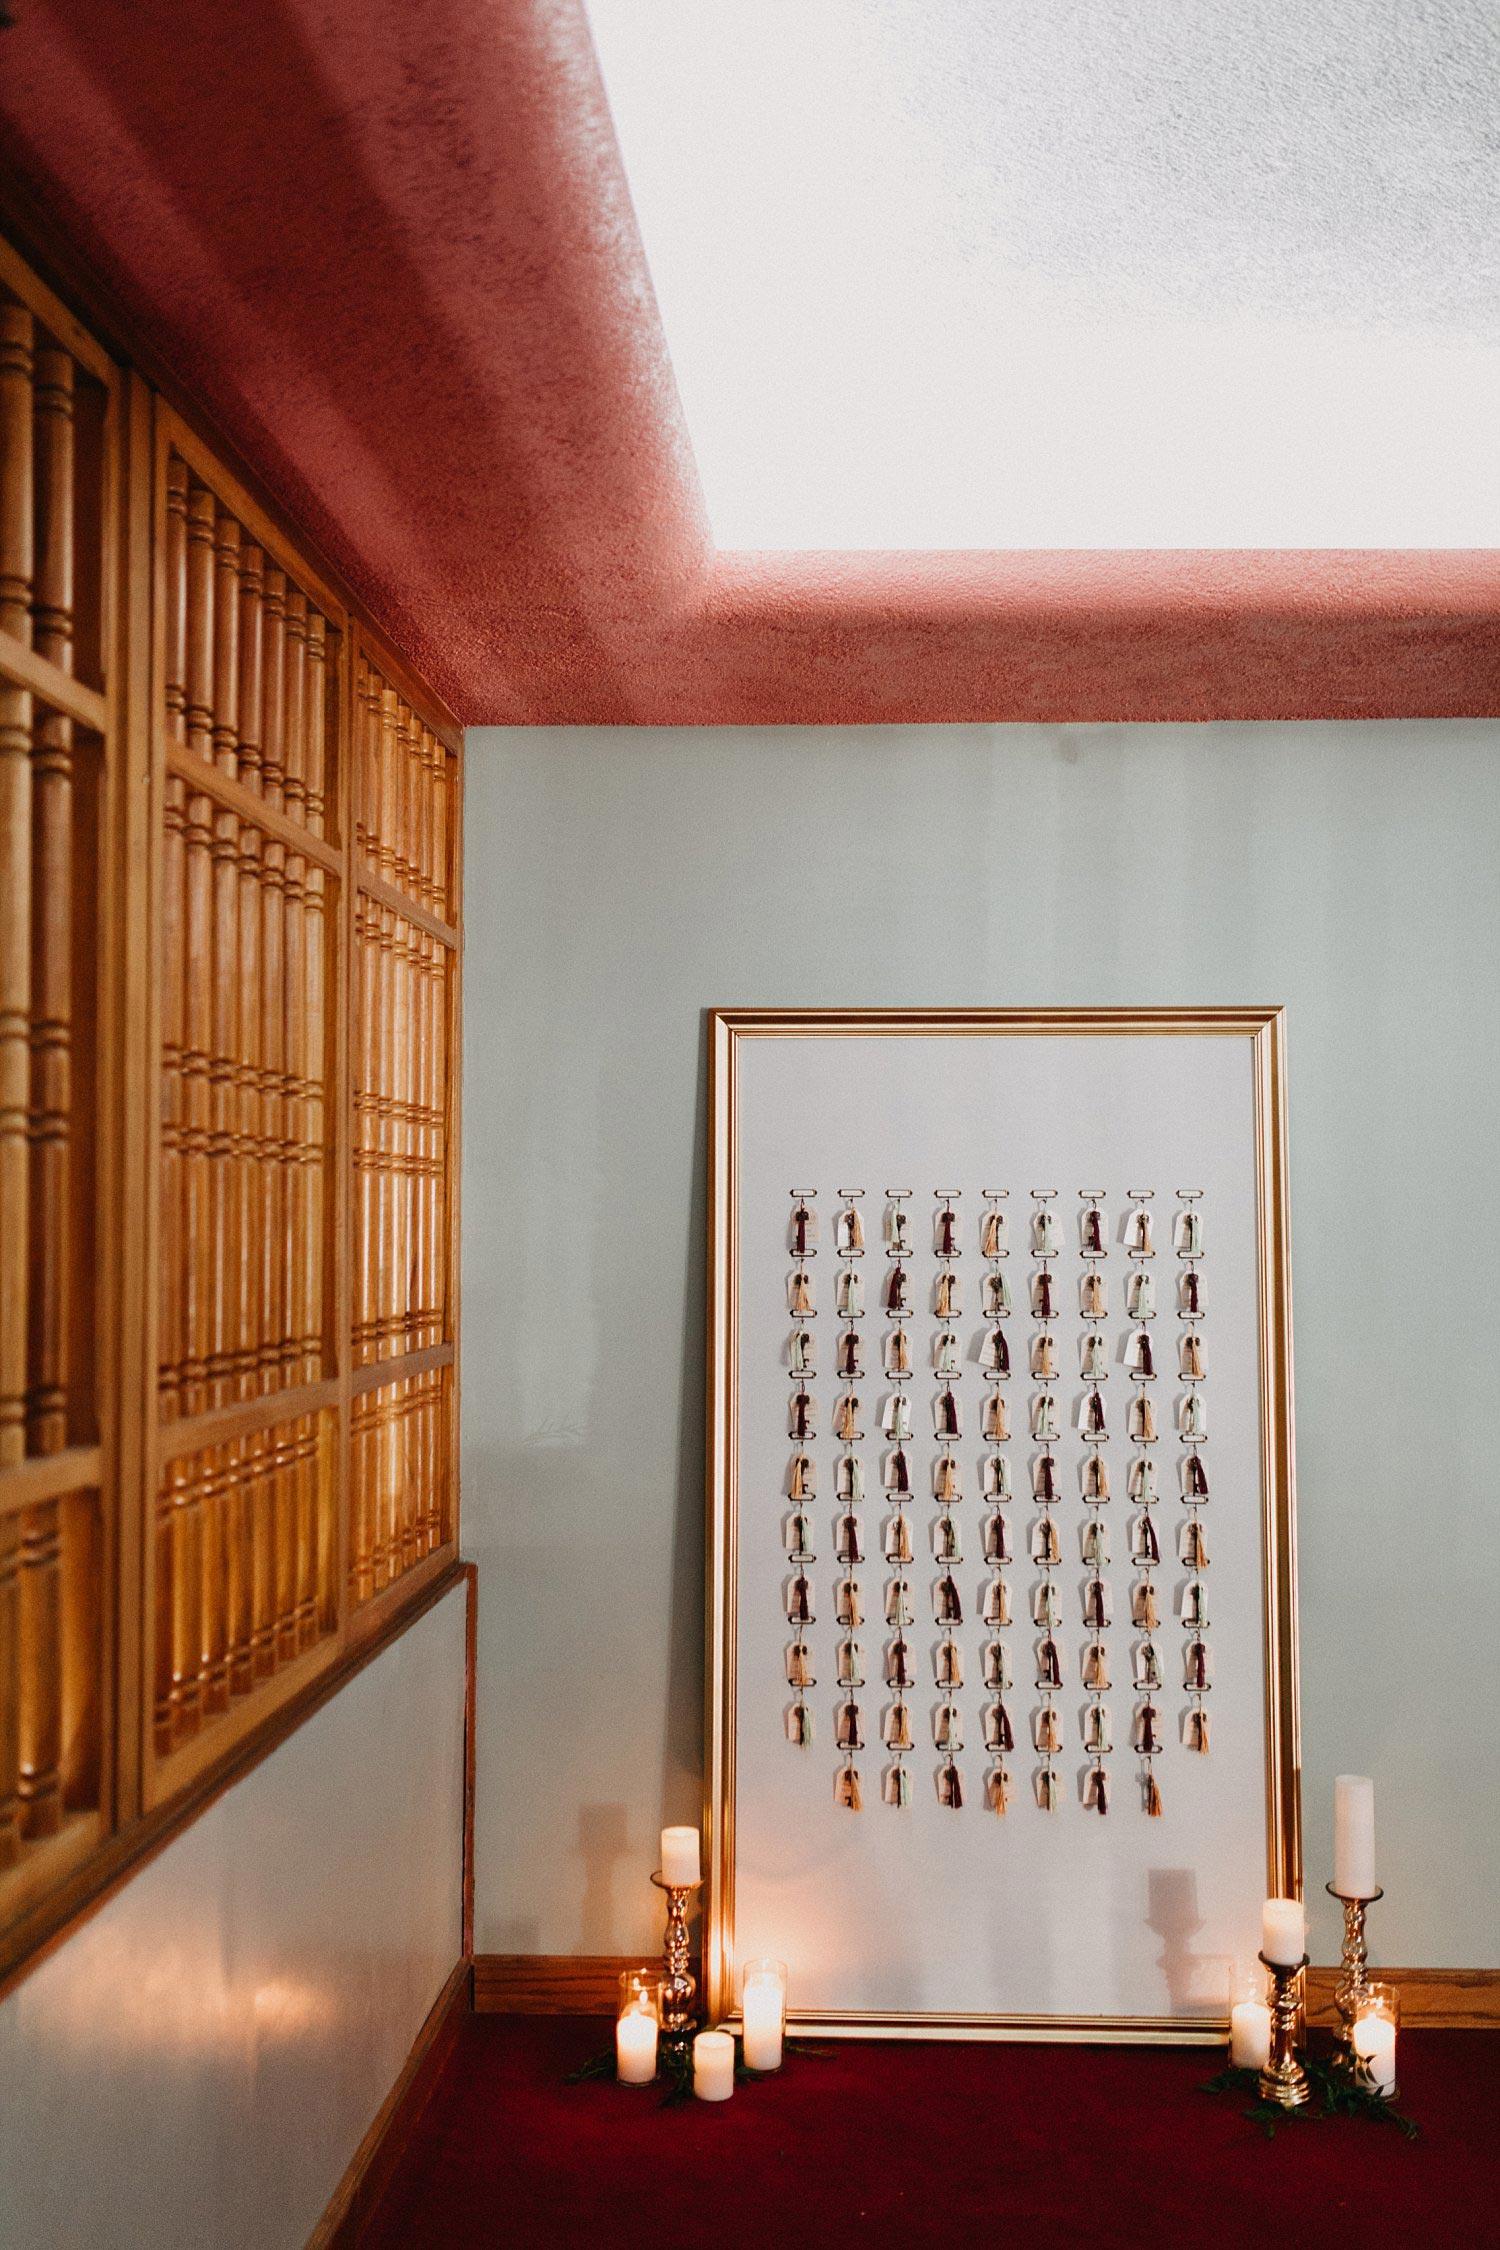 Room key seating chart